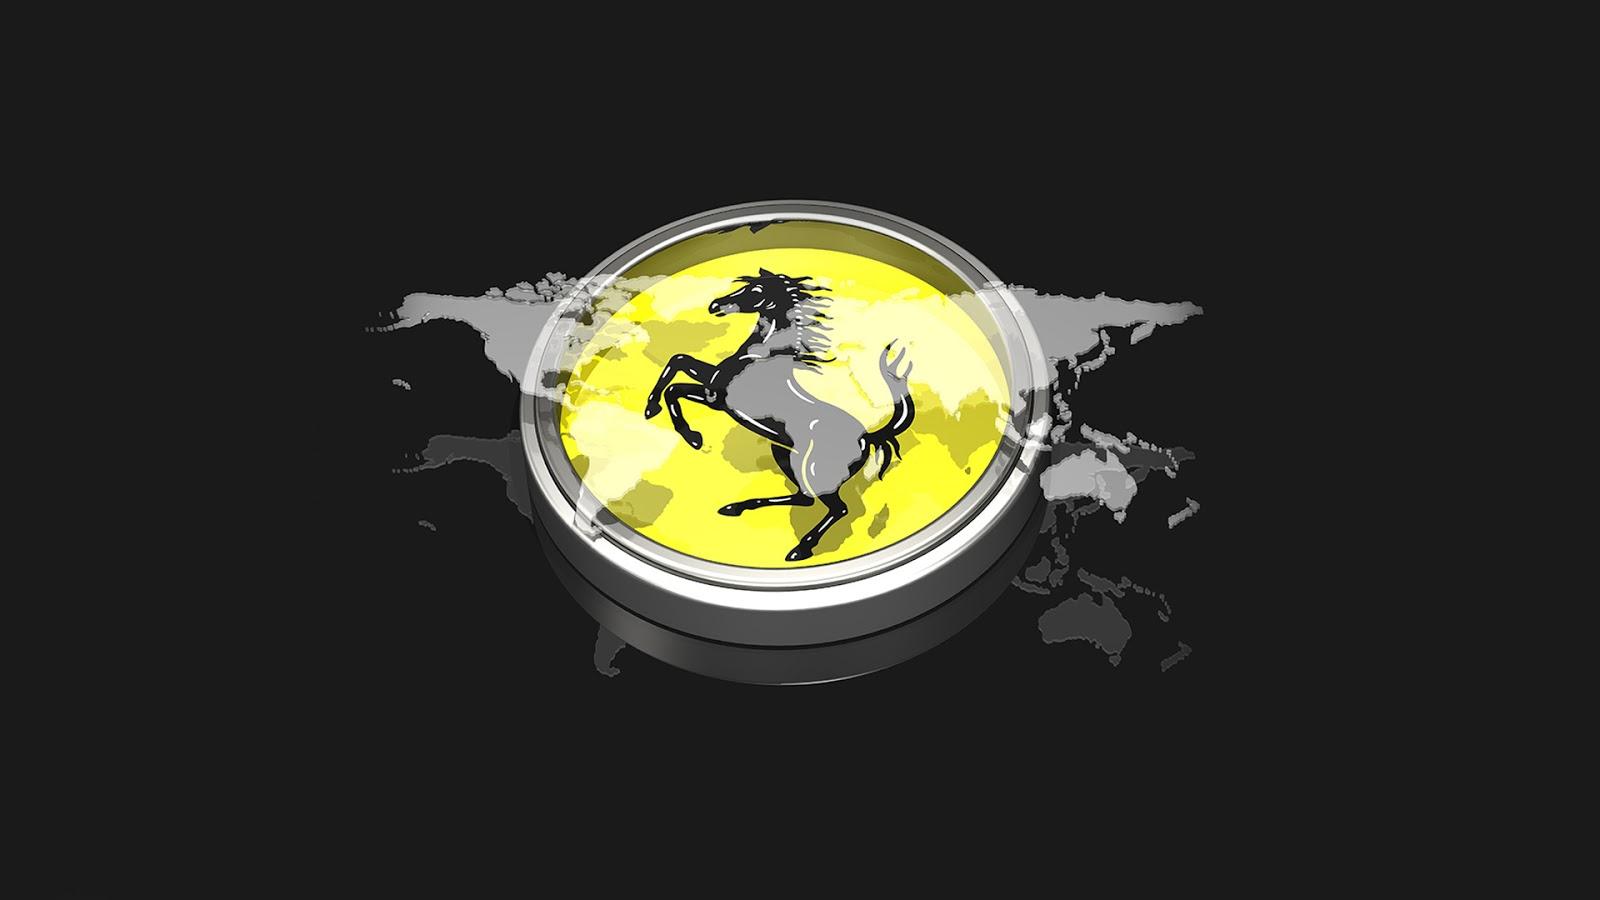 sony hd wallpapers 1080p - Ferrari Logo Wallpaper